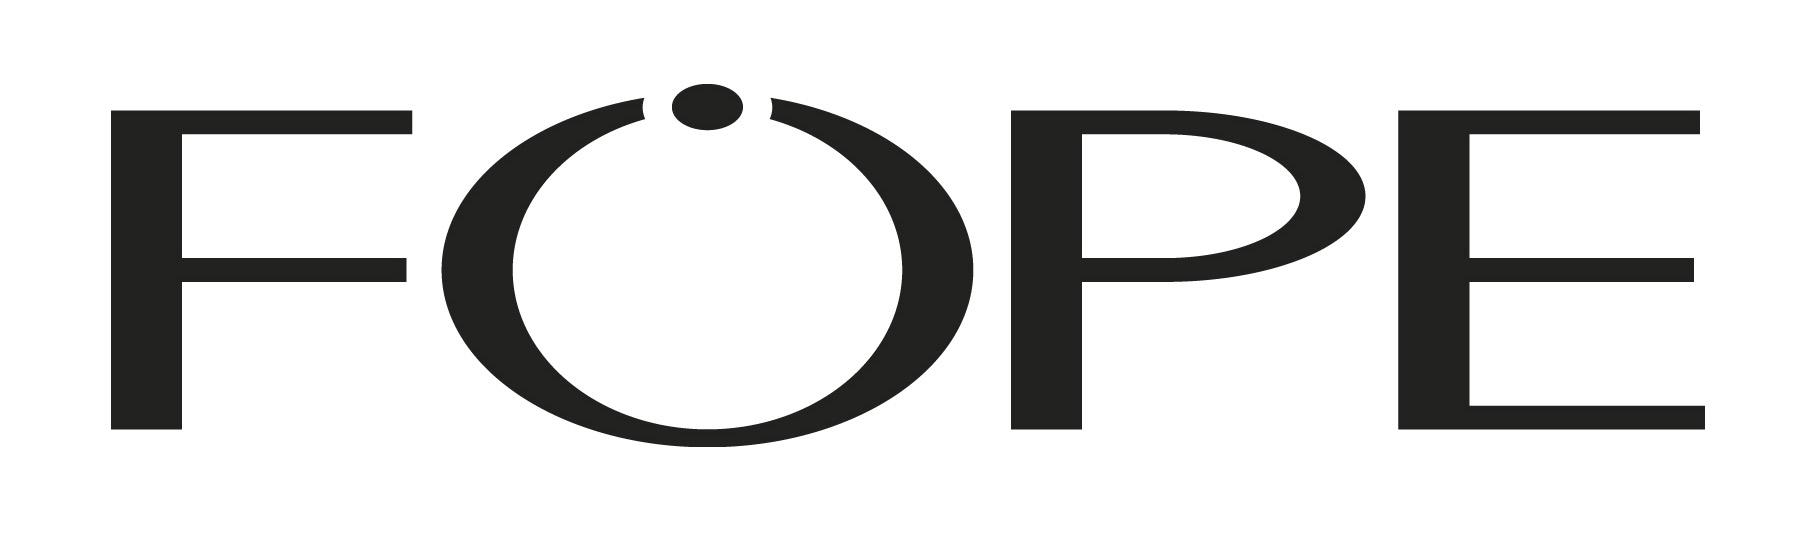 Fope - Casavola Noci - Logo